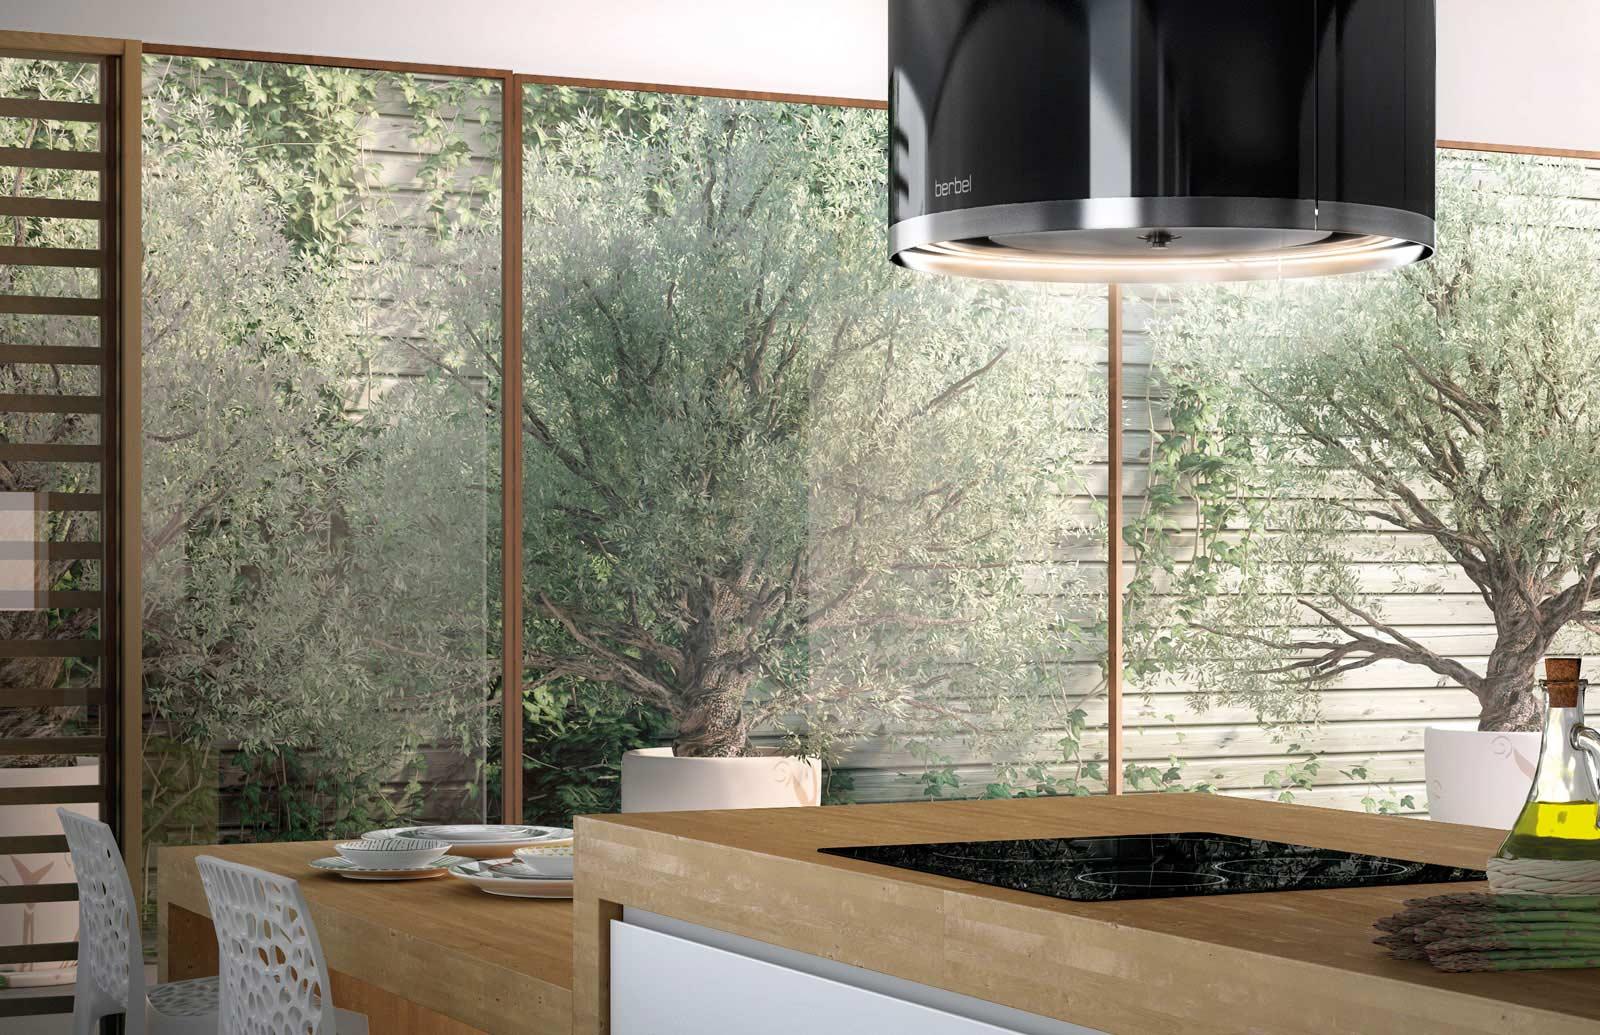 pagina iniziale berbel ablufttechnik gmbh. Black Bedroom Furniture Sets. Home Design Ideas